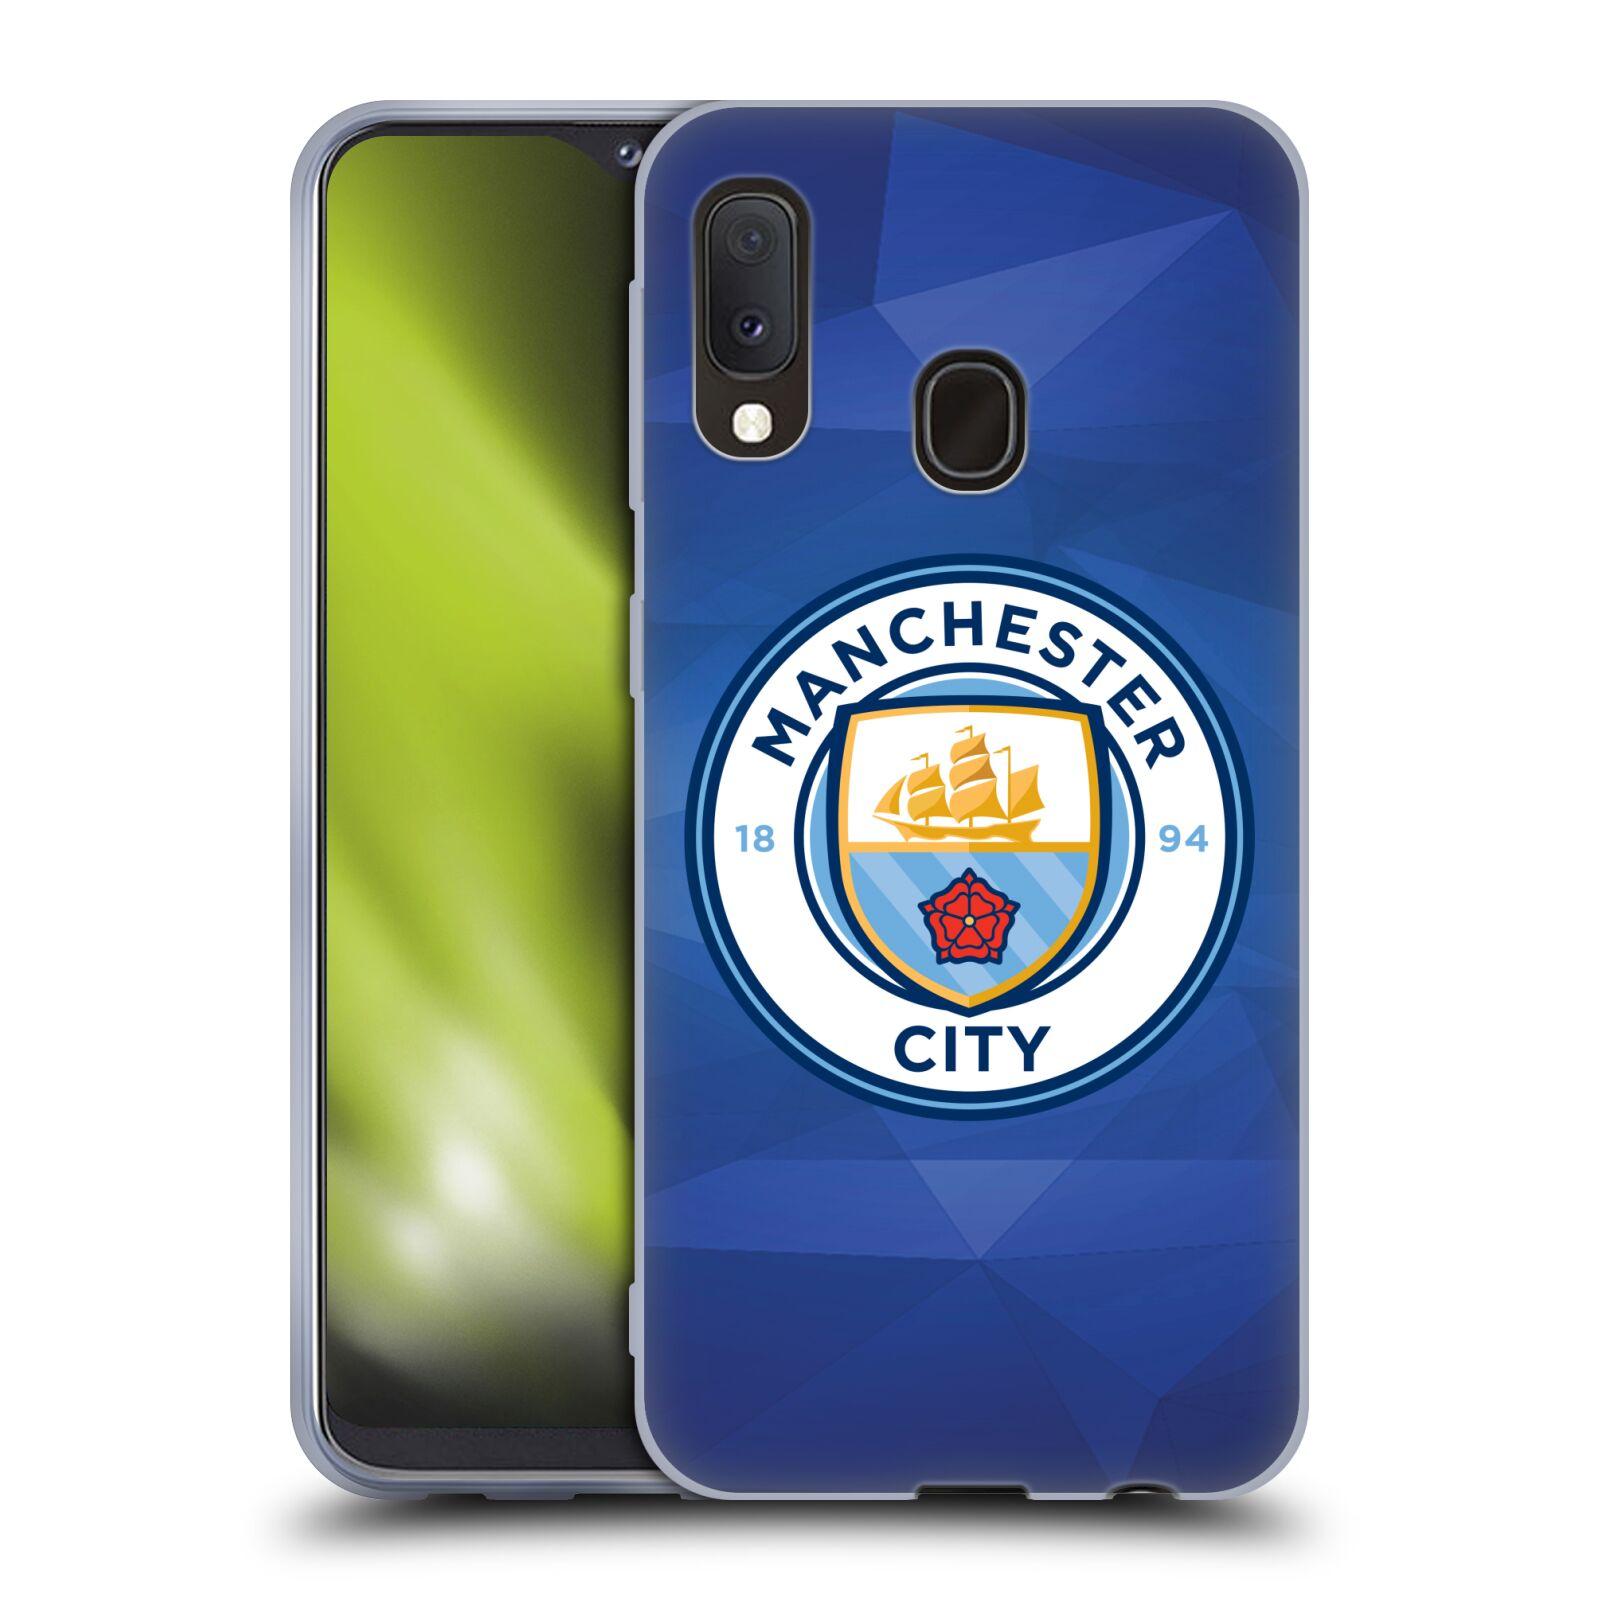 Silikonové pouzdro na mobil Samsung Galaxy A20e - Head Case - Manchester City FC - Modré nové logo